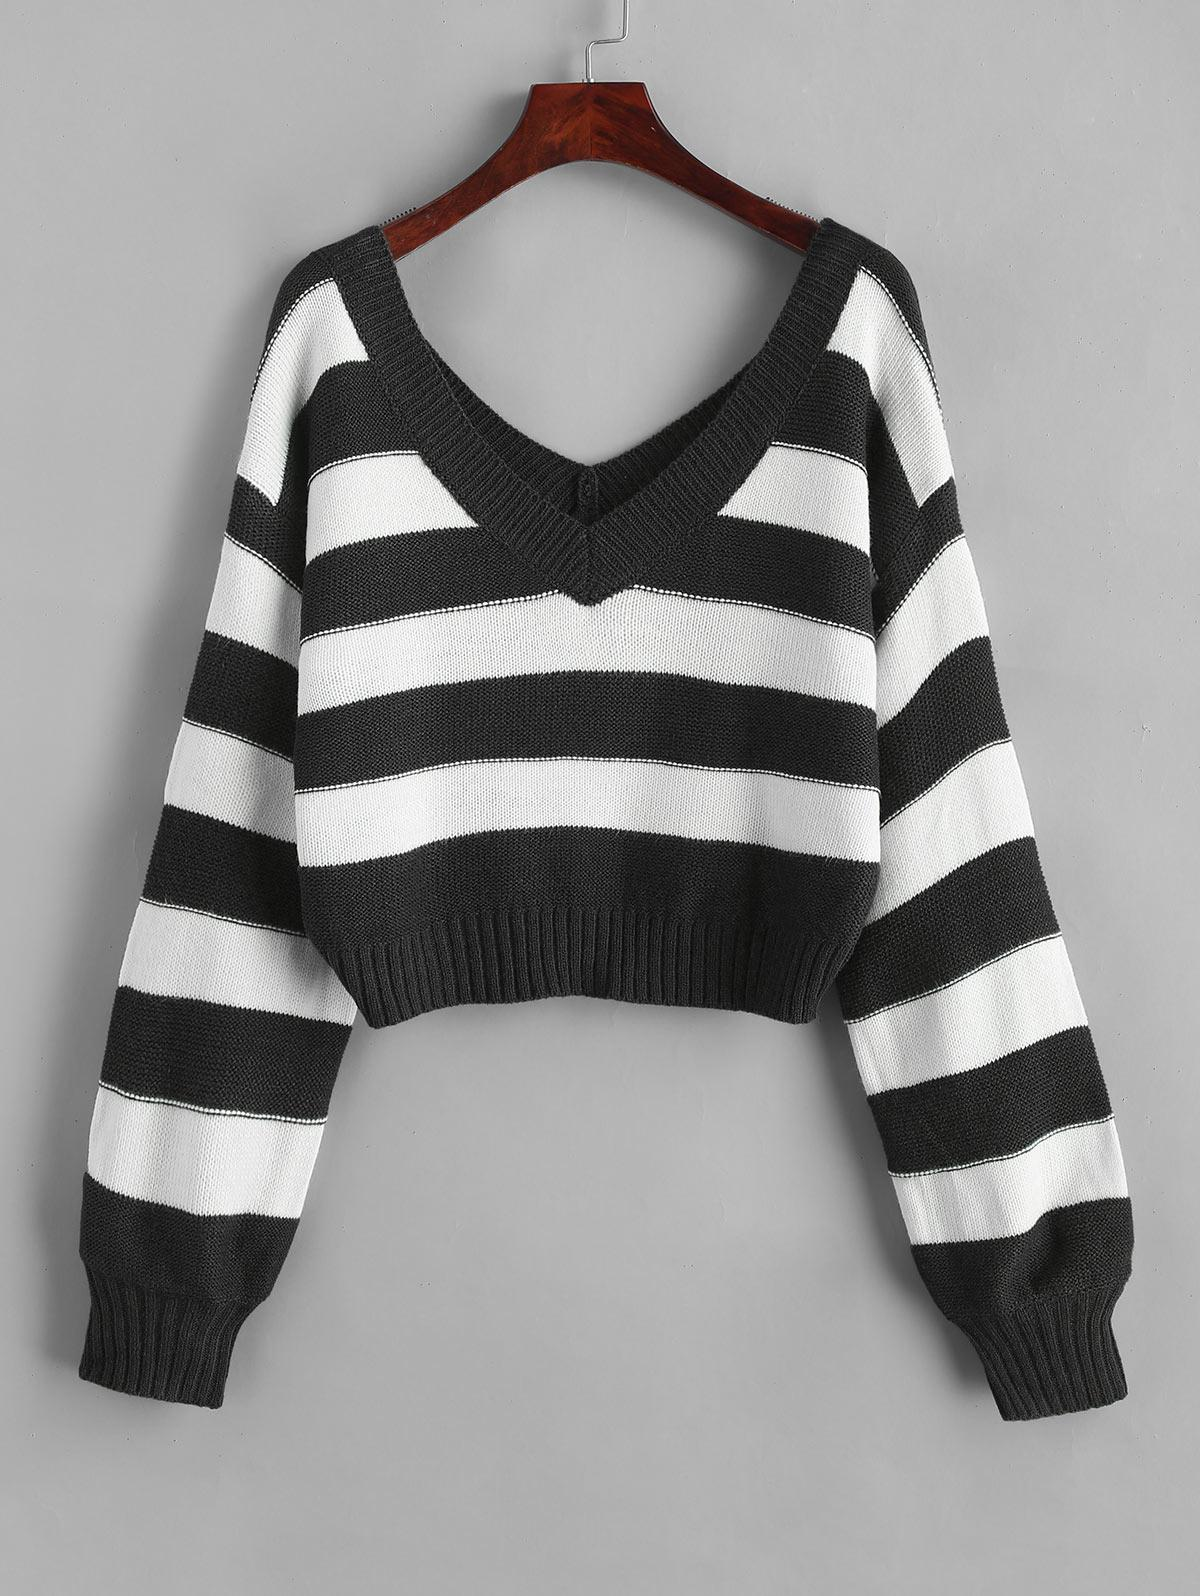 ZAFUL Double V Stripes Color Block Pullover Sweater, Black